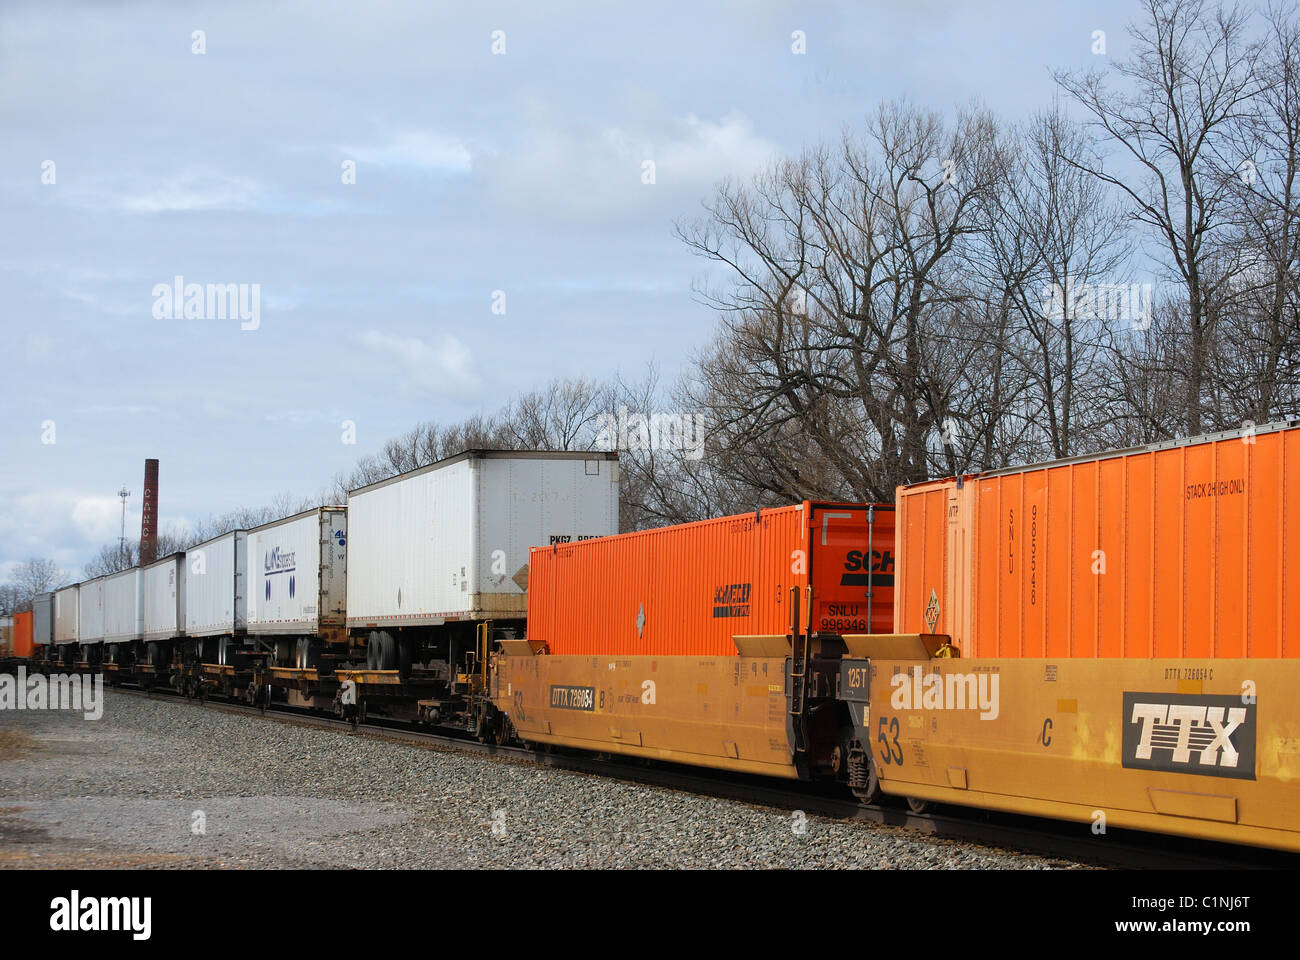 Csx Freight Train Cars Stock Photo 35510688 Alamy